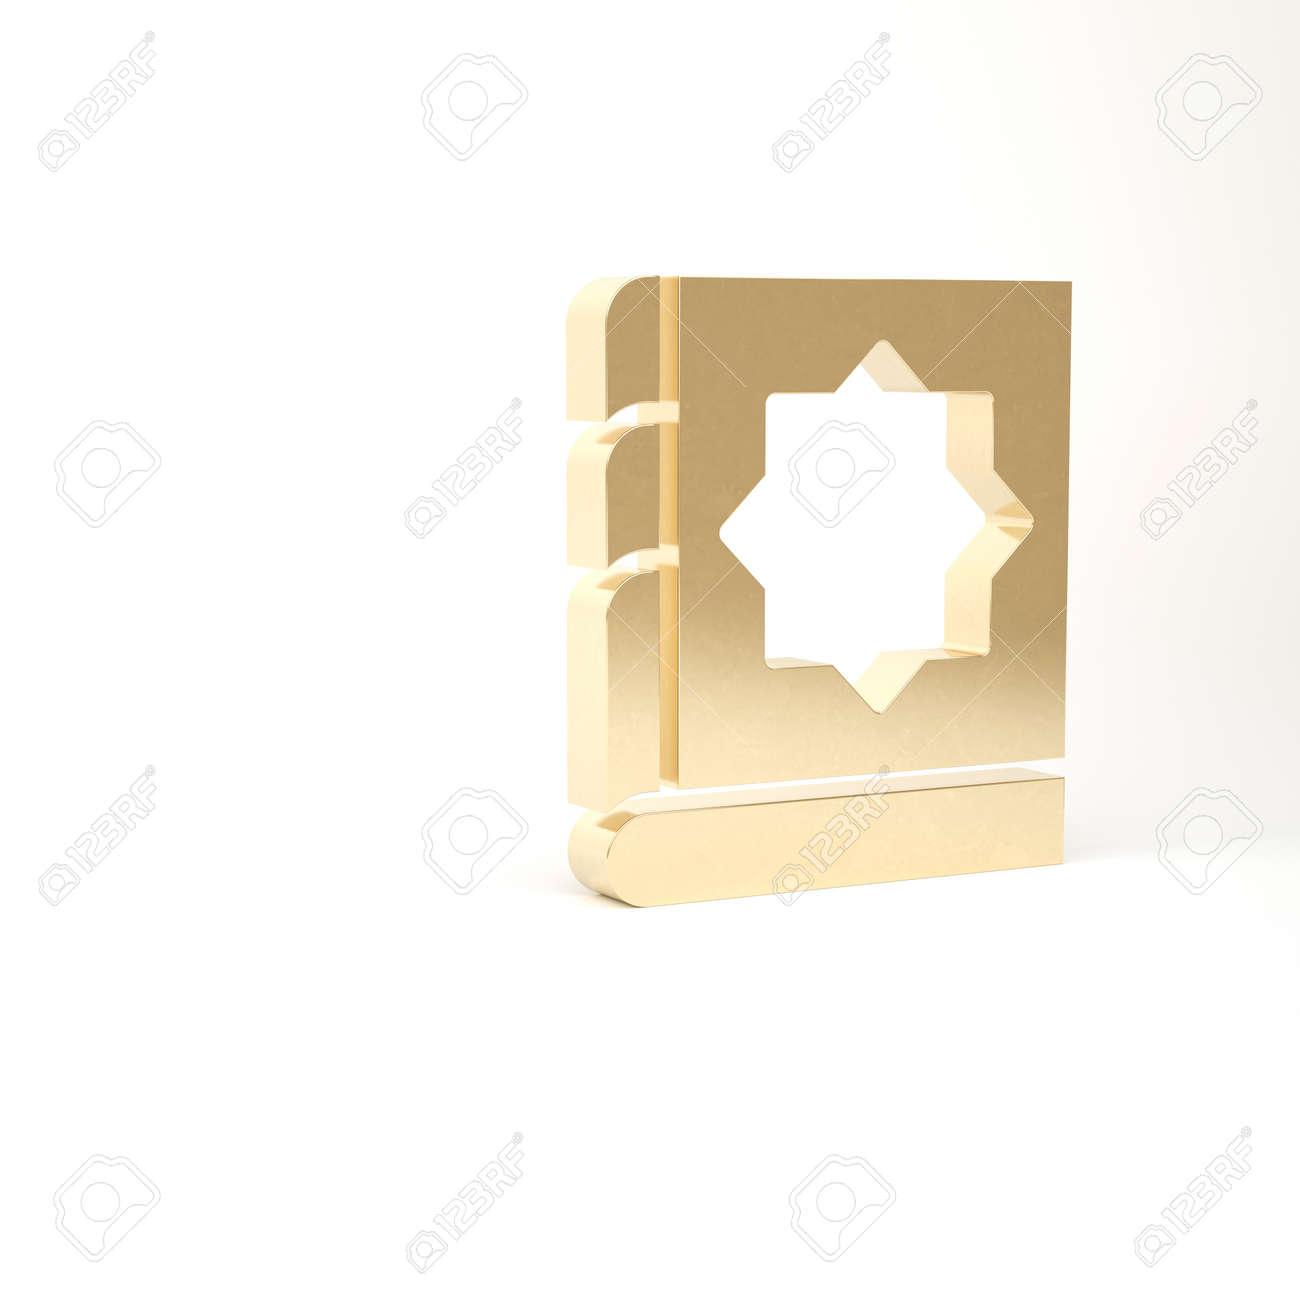 Gold Holy book of Koran icon isolated on white background. Muslim holiday, Eid Mubarak, Eid al-fitr, Ramadan Kareem. 3d illustration 3D render - 169797706